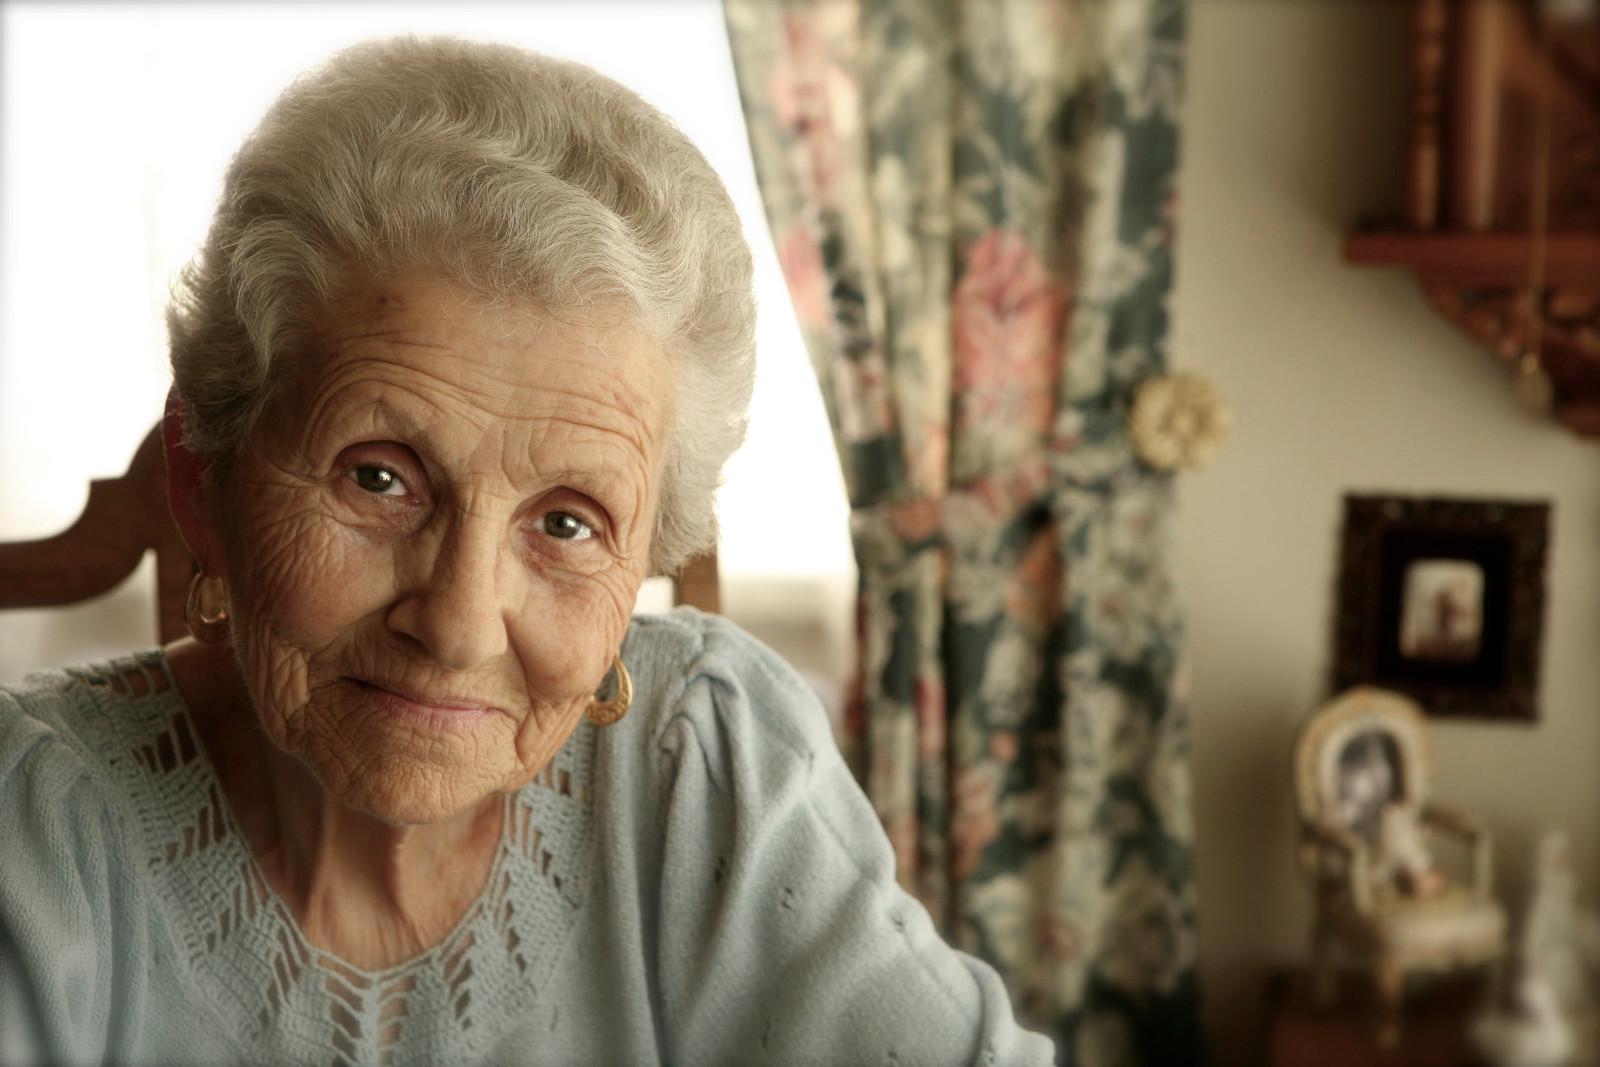 Choosing Respite Care for Your Elderly Parent